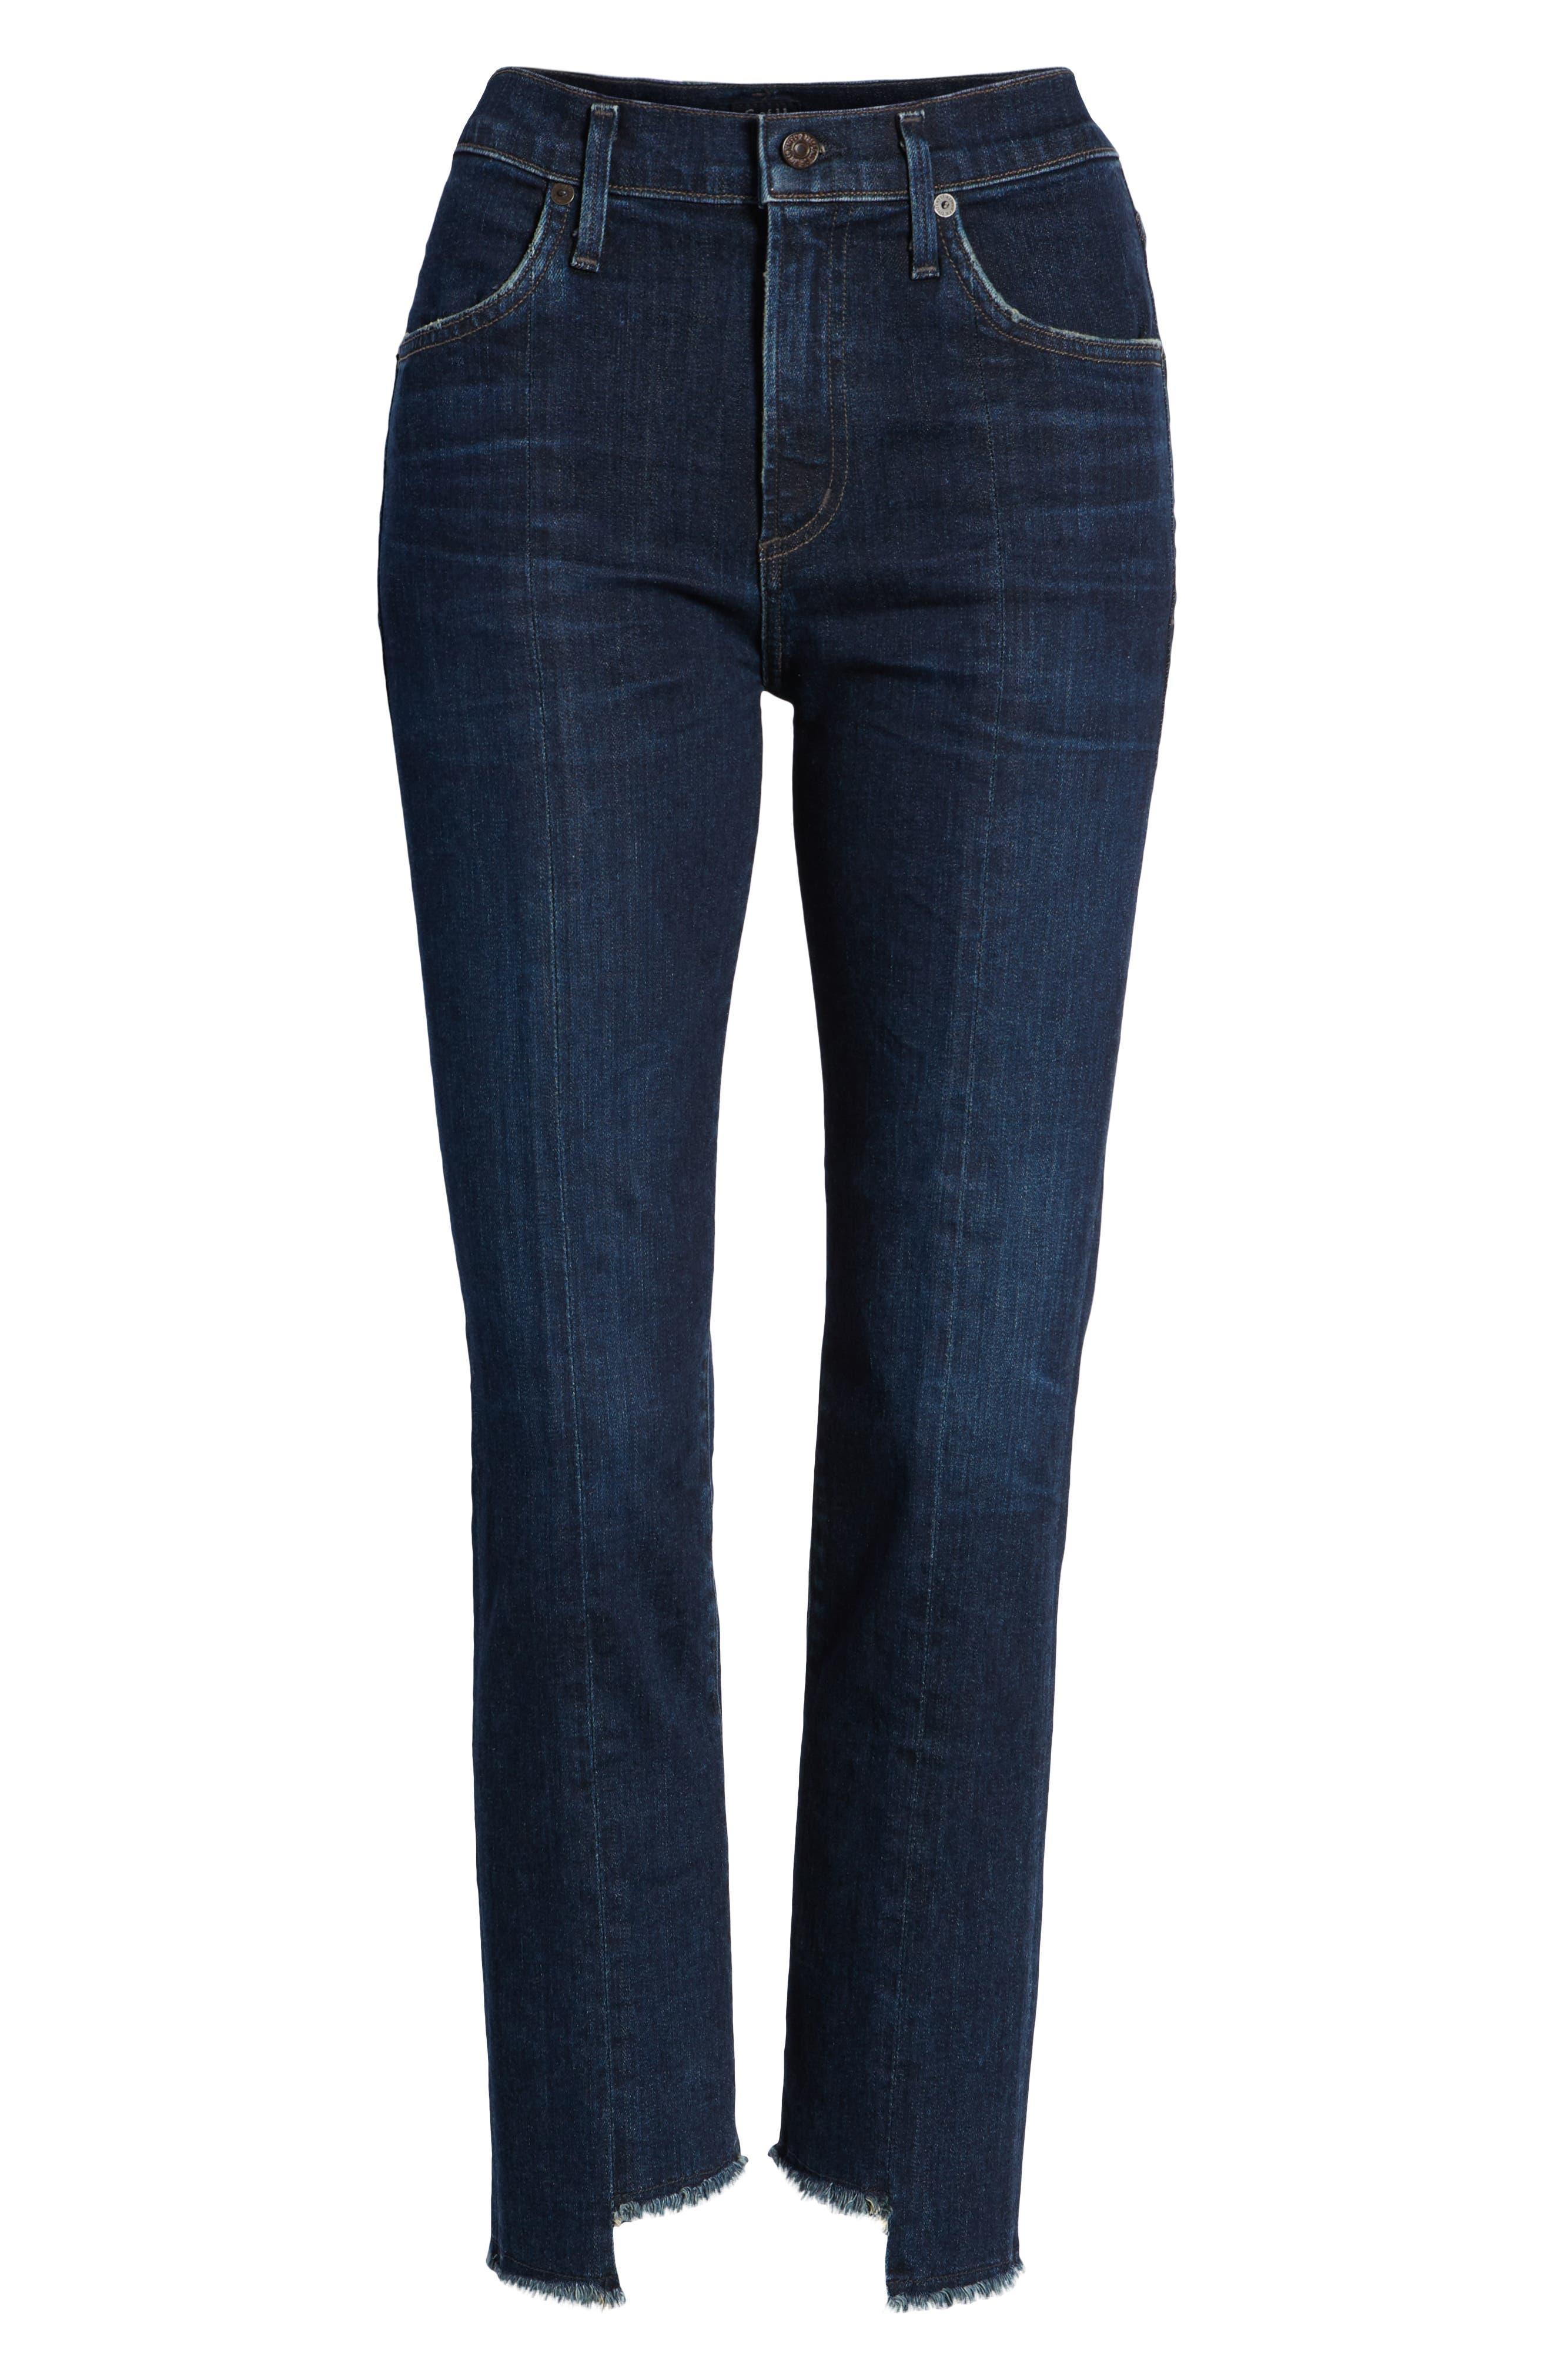 Amari Ankle Skinny Jeans,                             Alternate thumbnail 7, color,                             401